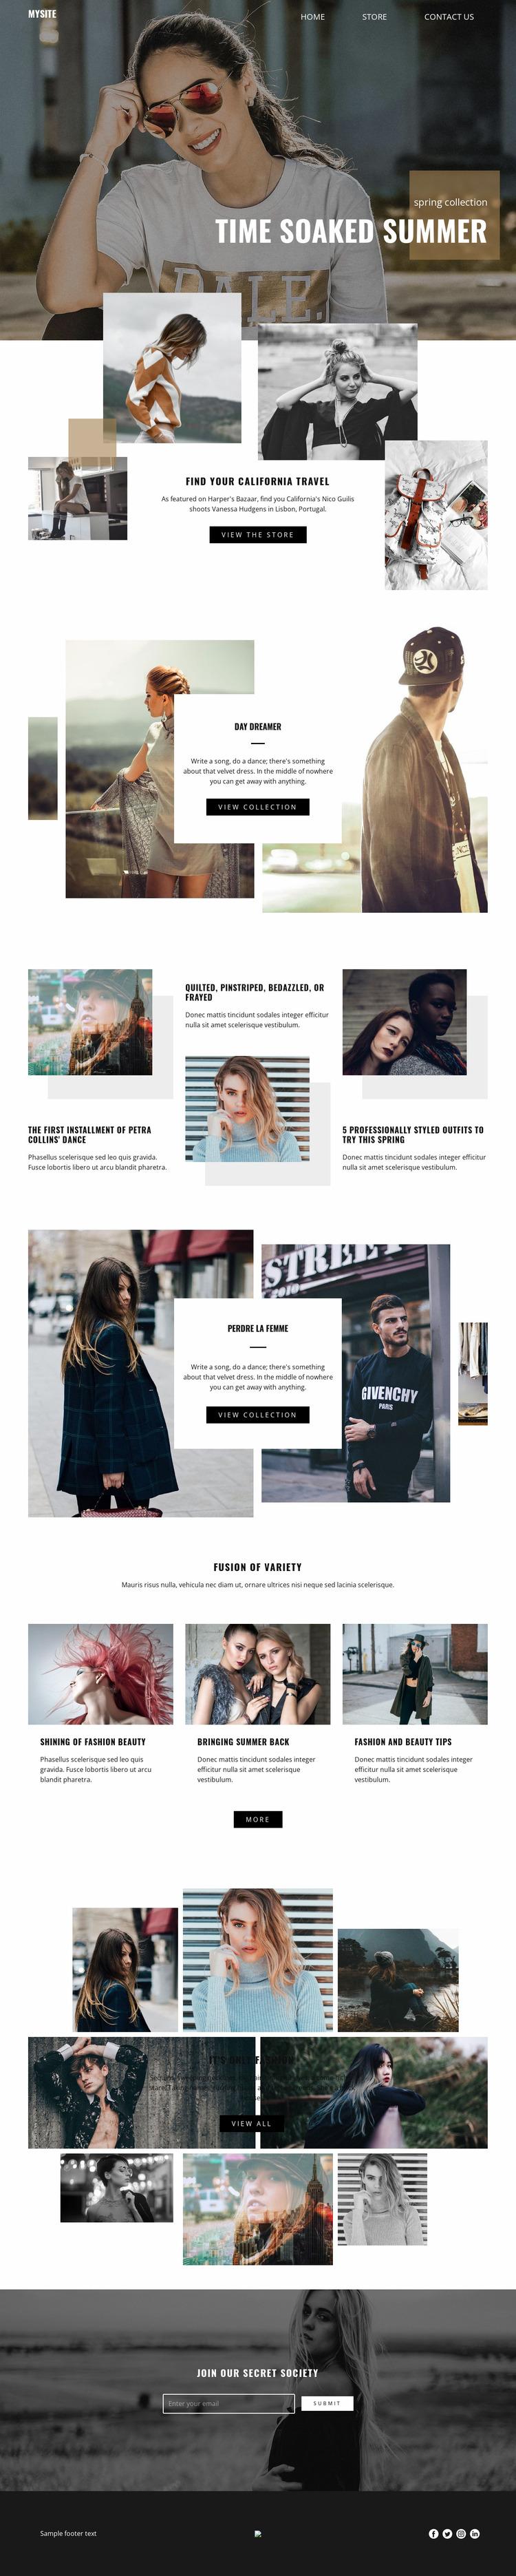 Summer time collection Website Mockup